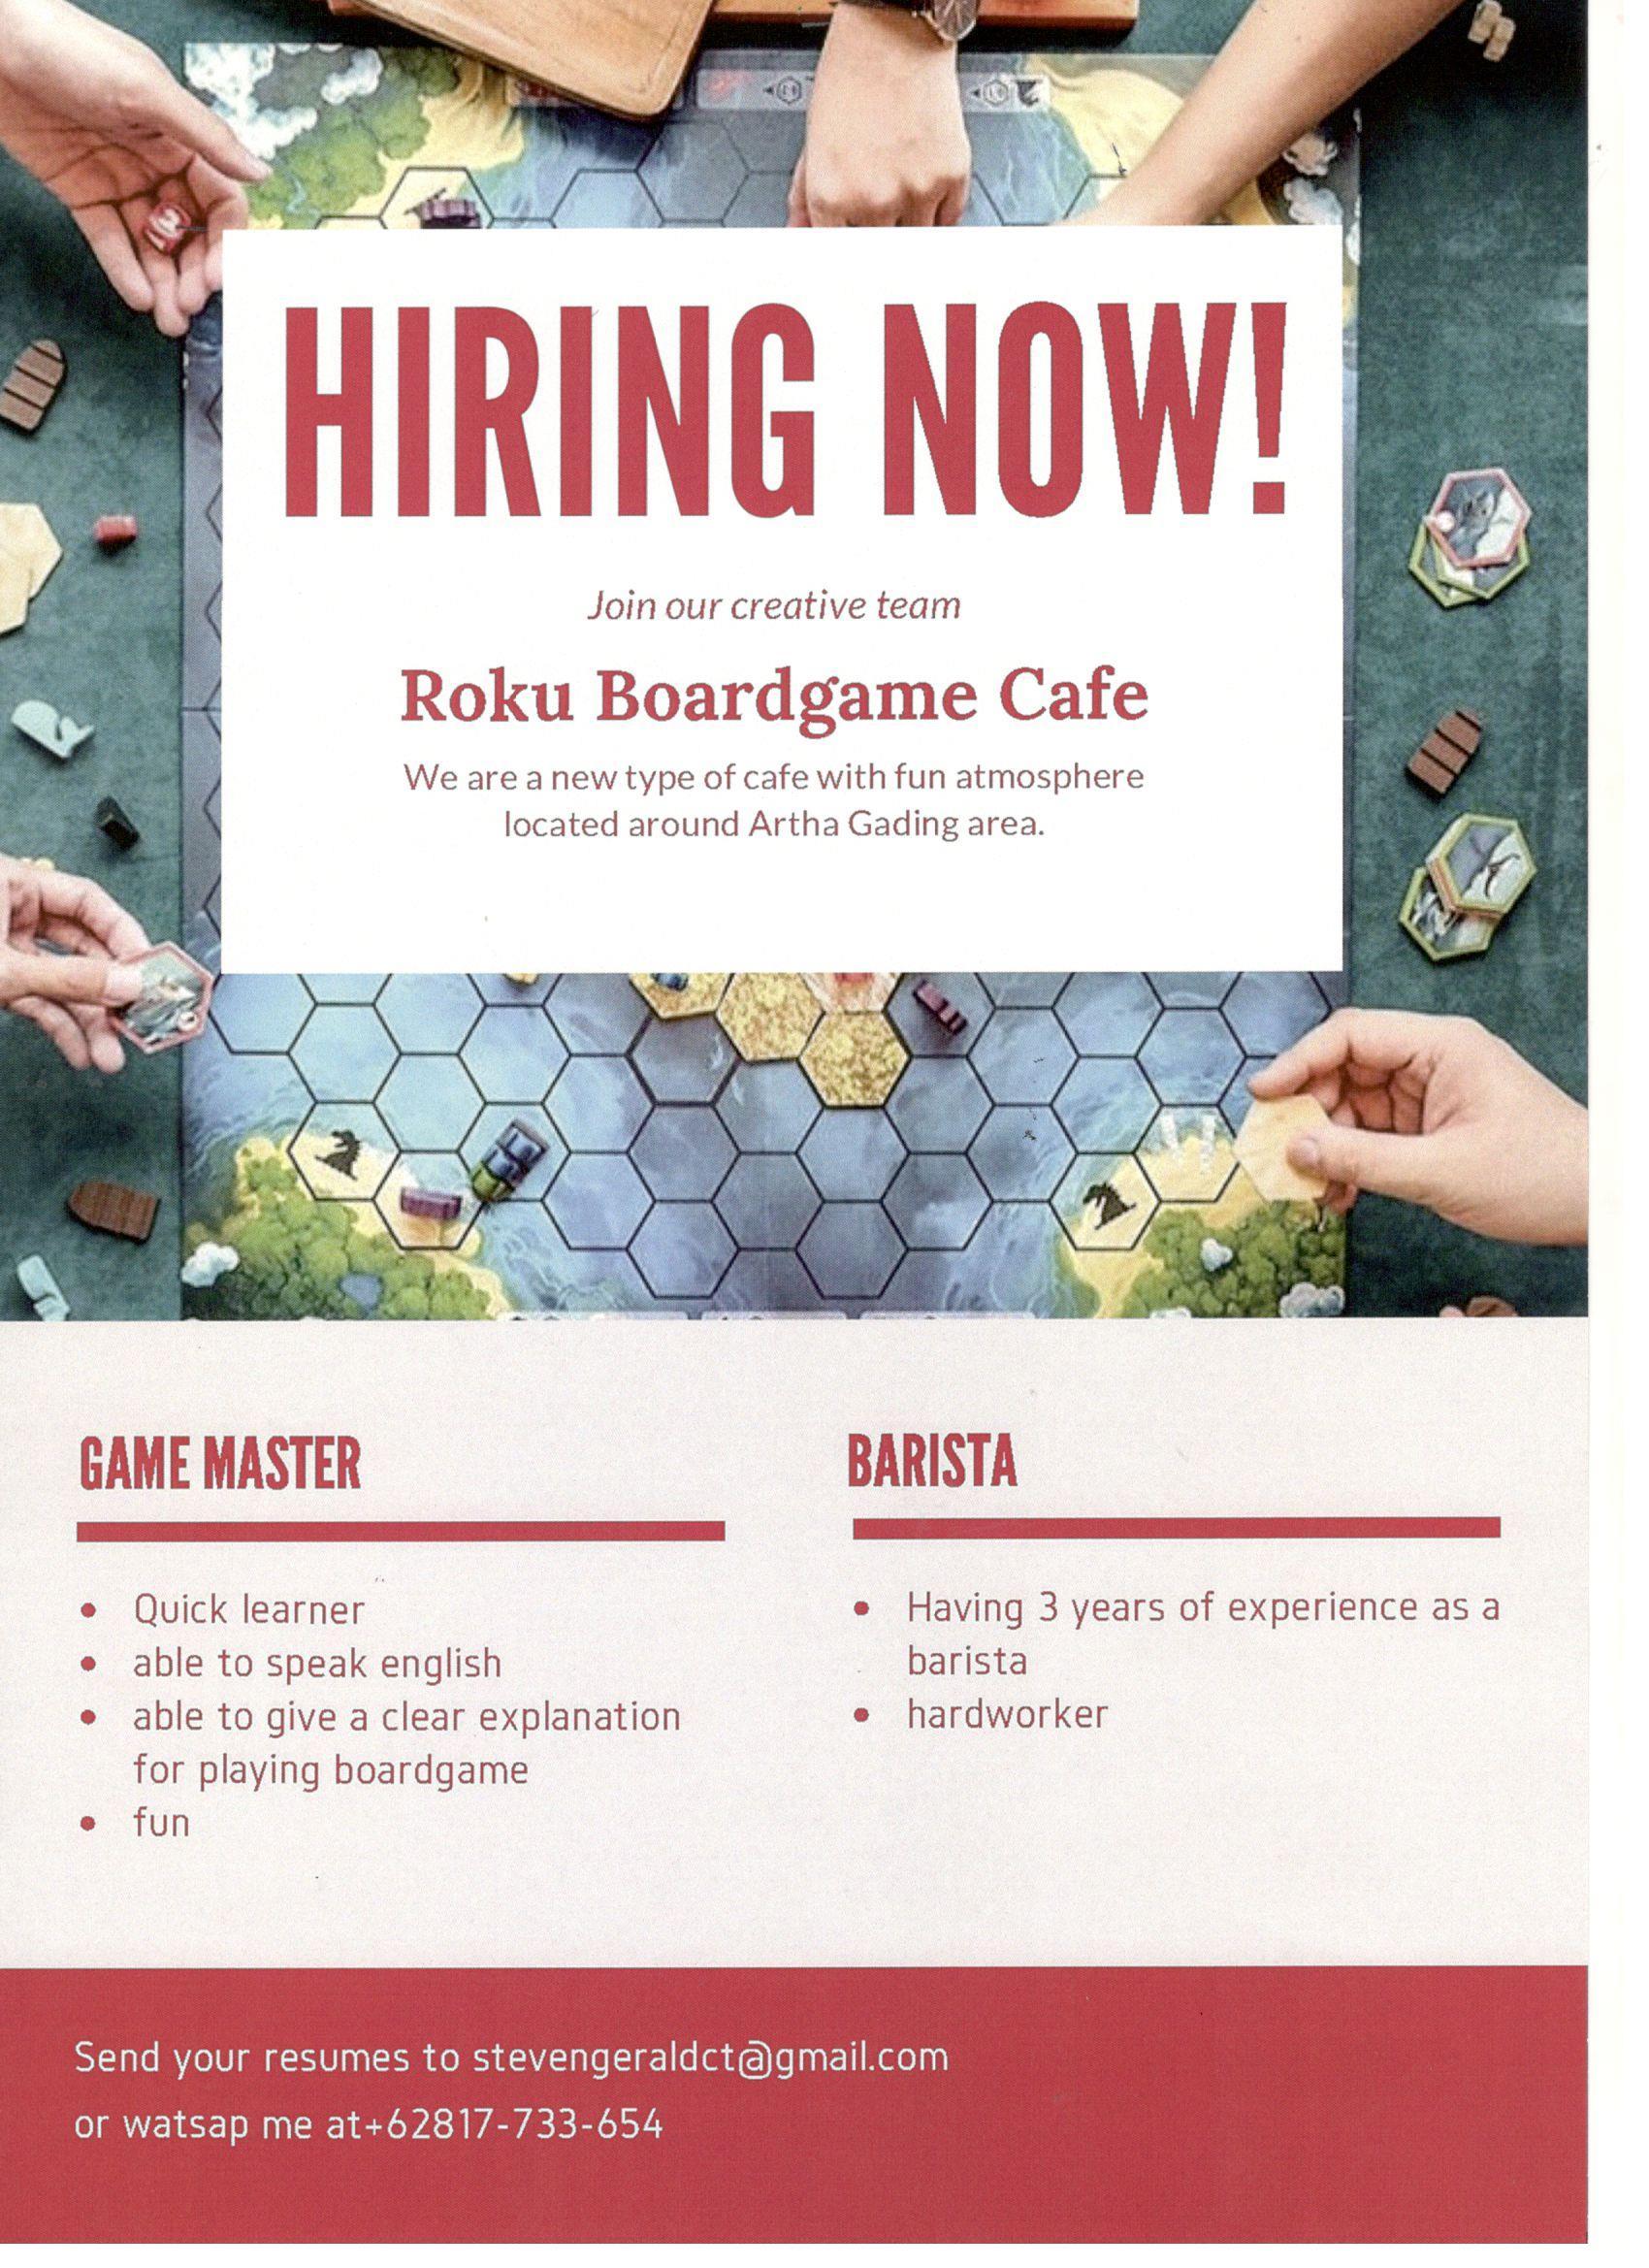 Lowongan Pekerjaan Roku Boardgame Cafe